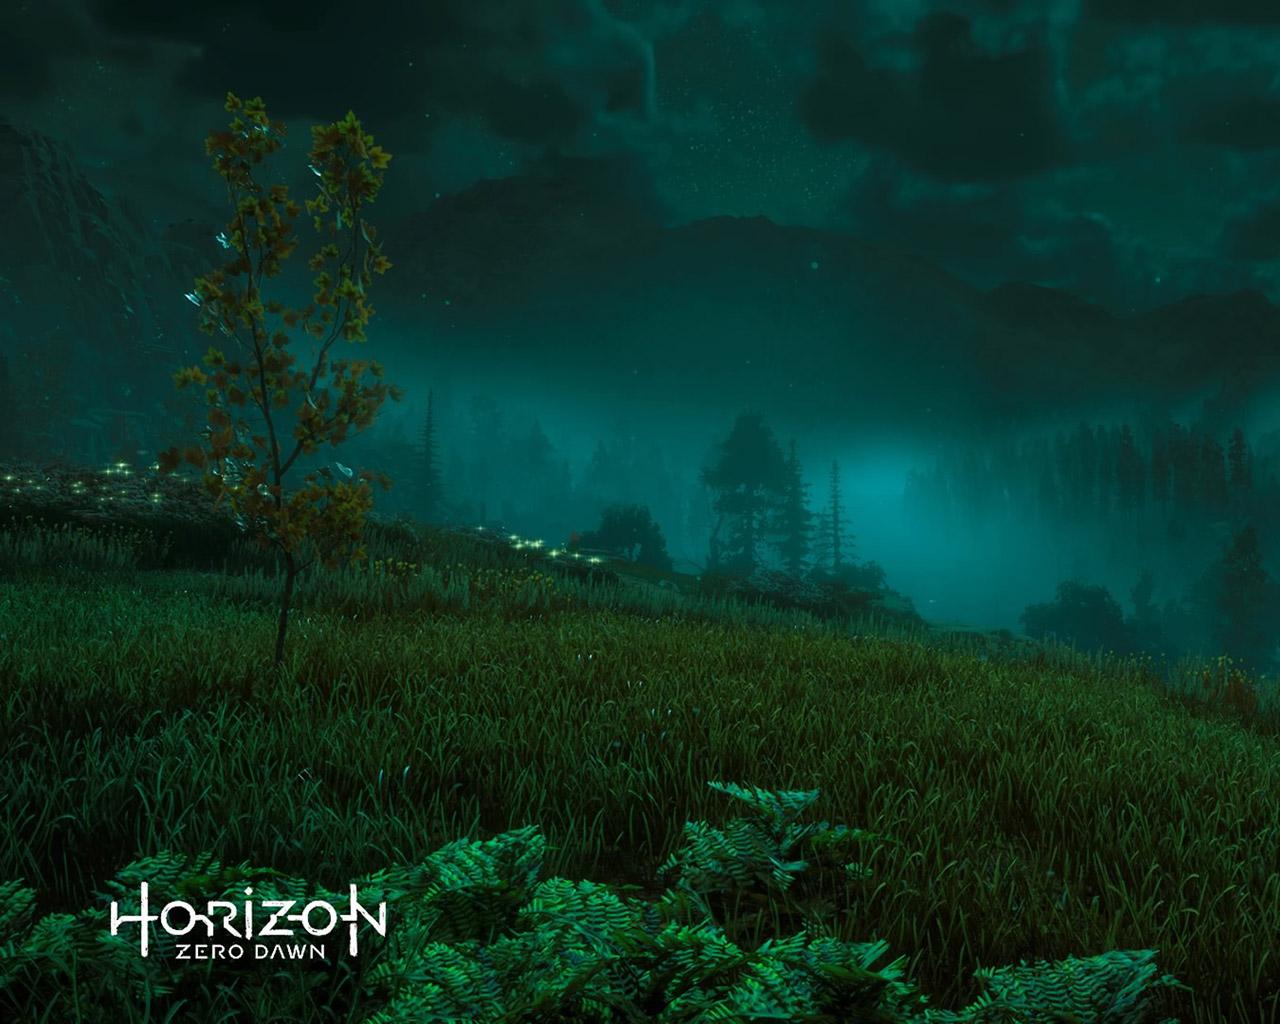 Free Horizon Zero Dawn Wallpaper in 1280x1024